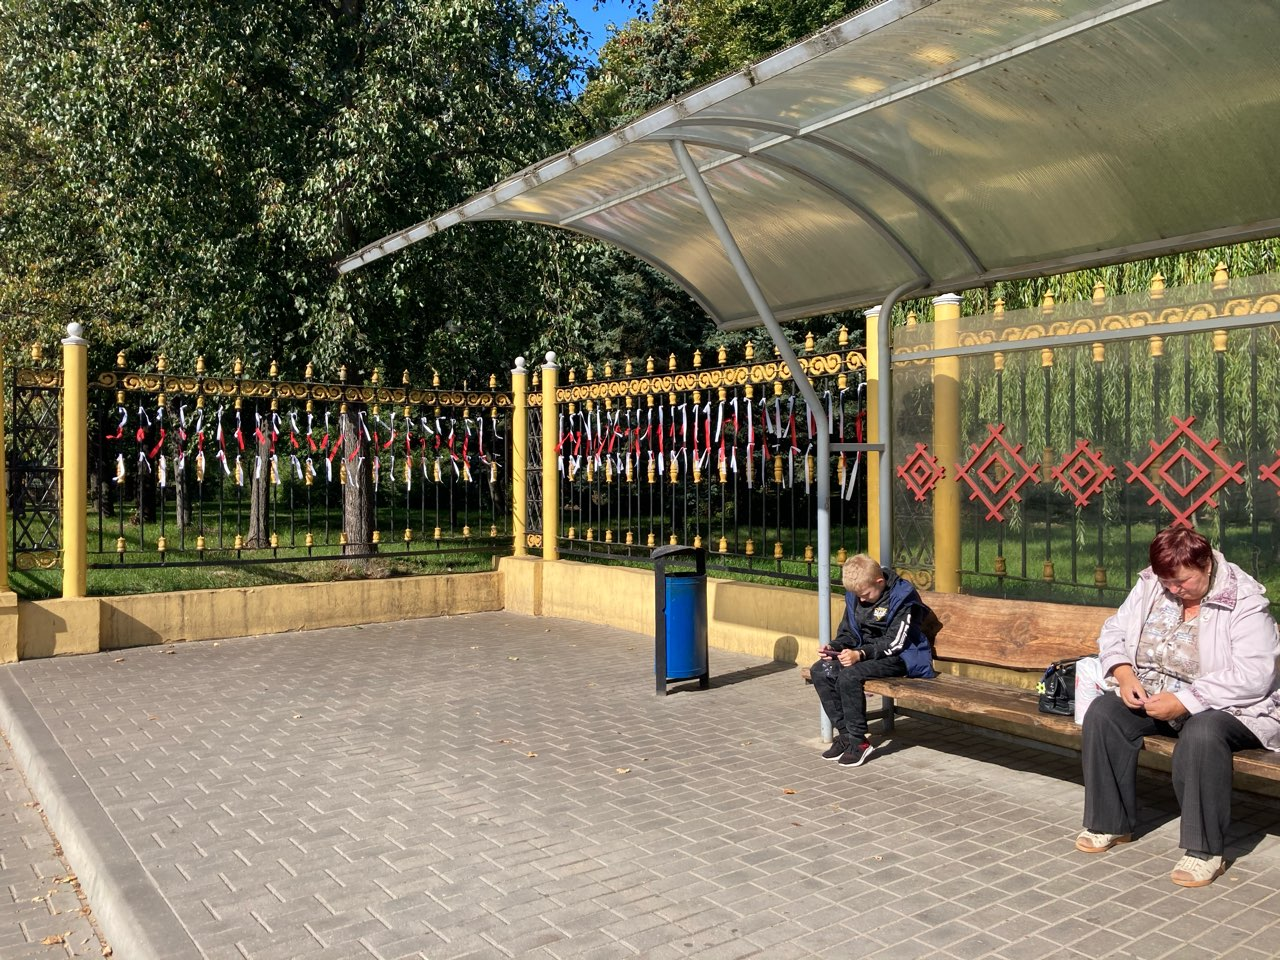 14 сентября. Остановка «Улица Гагарина» возле молодого парка. Фото: Ирина КОМИК